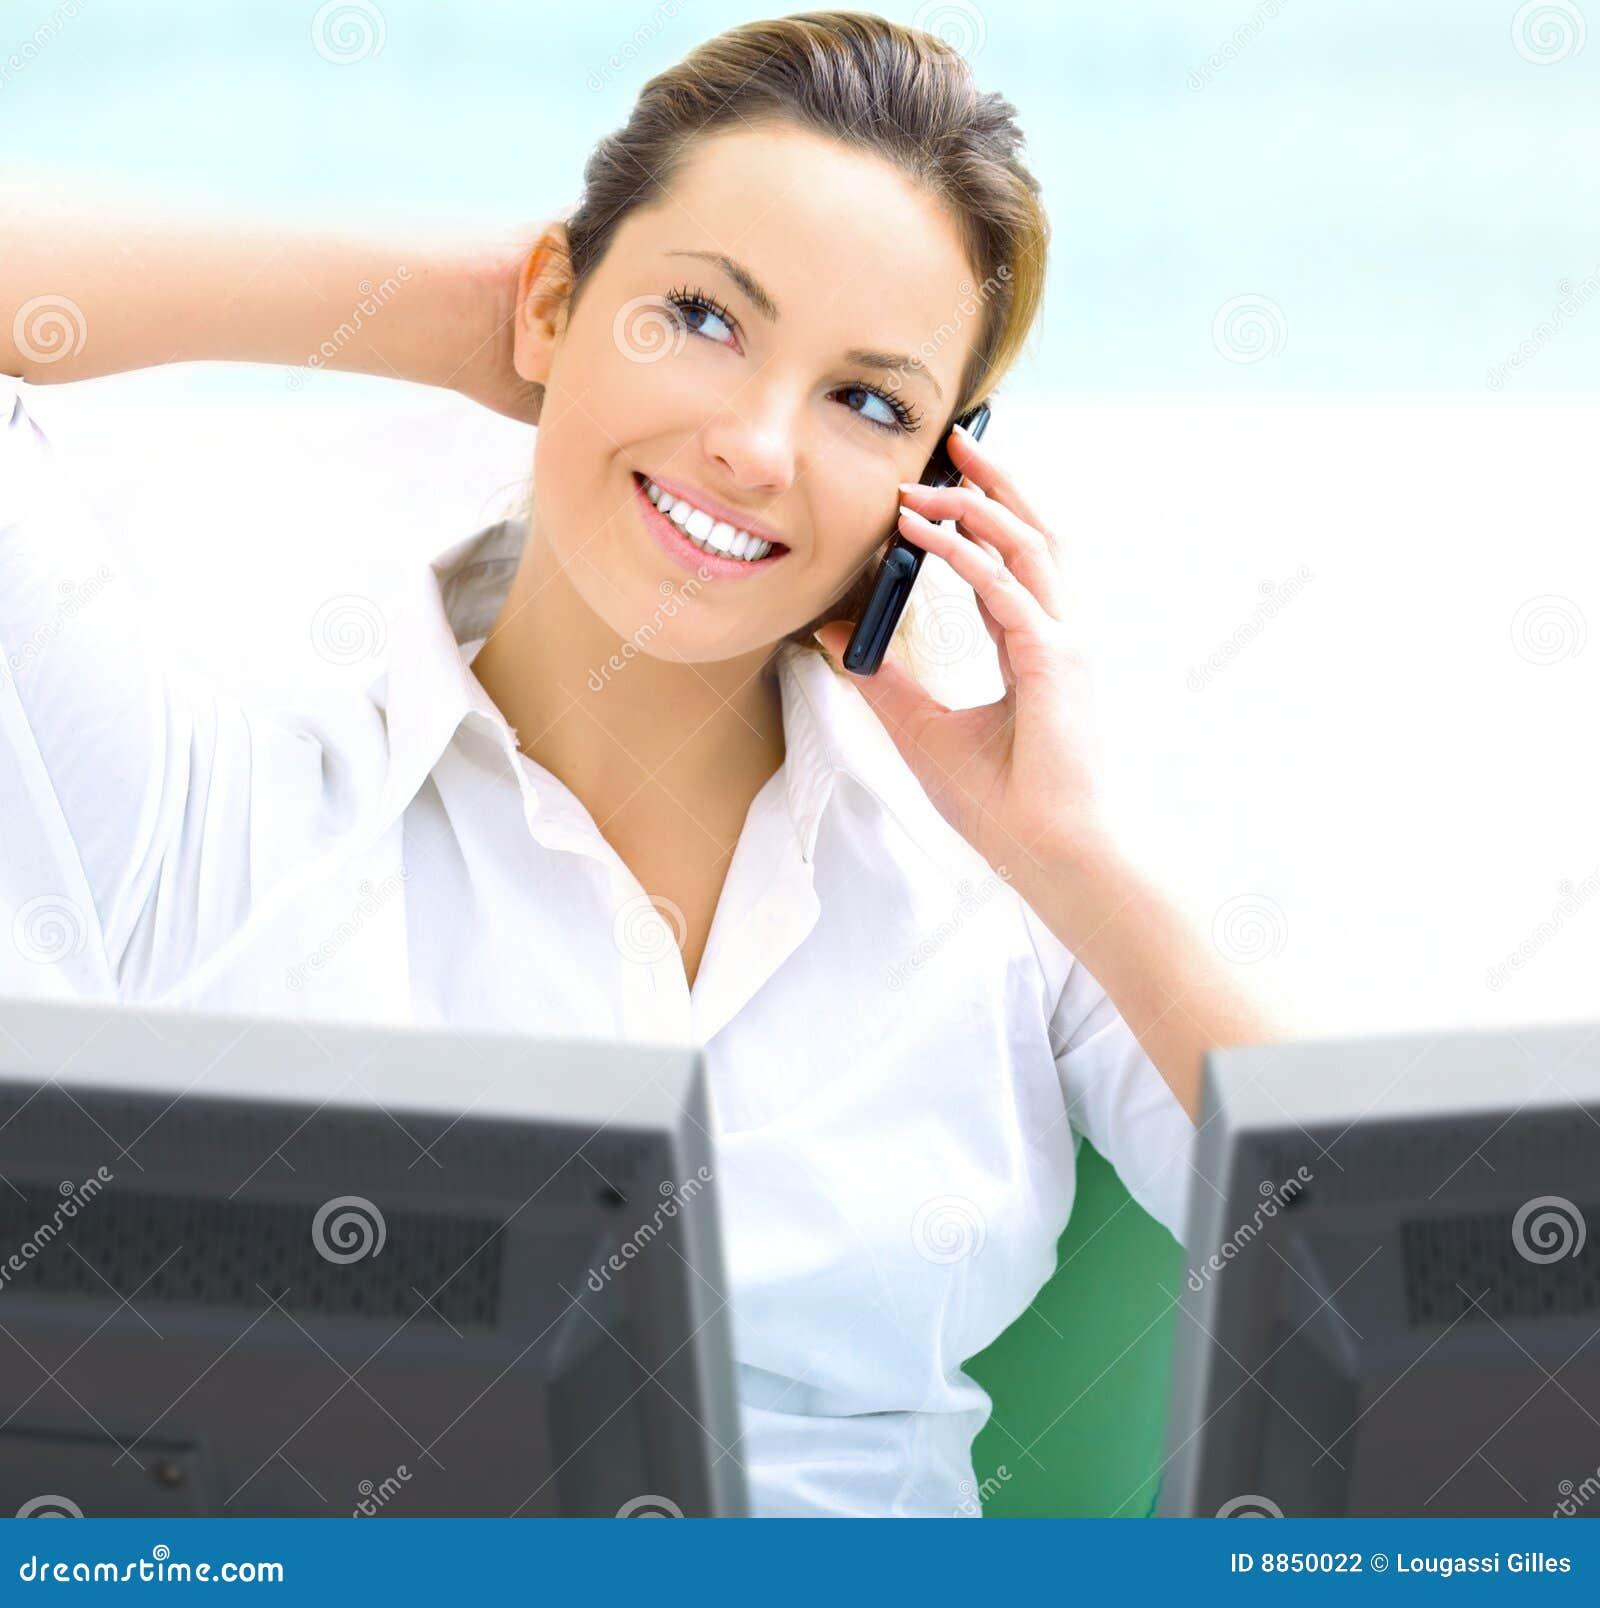 Blond business woman